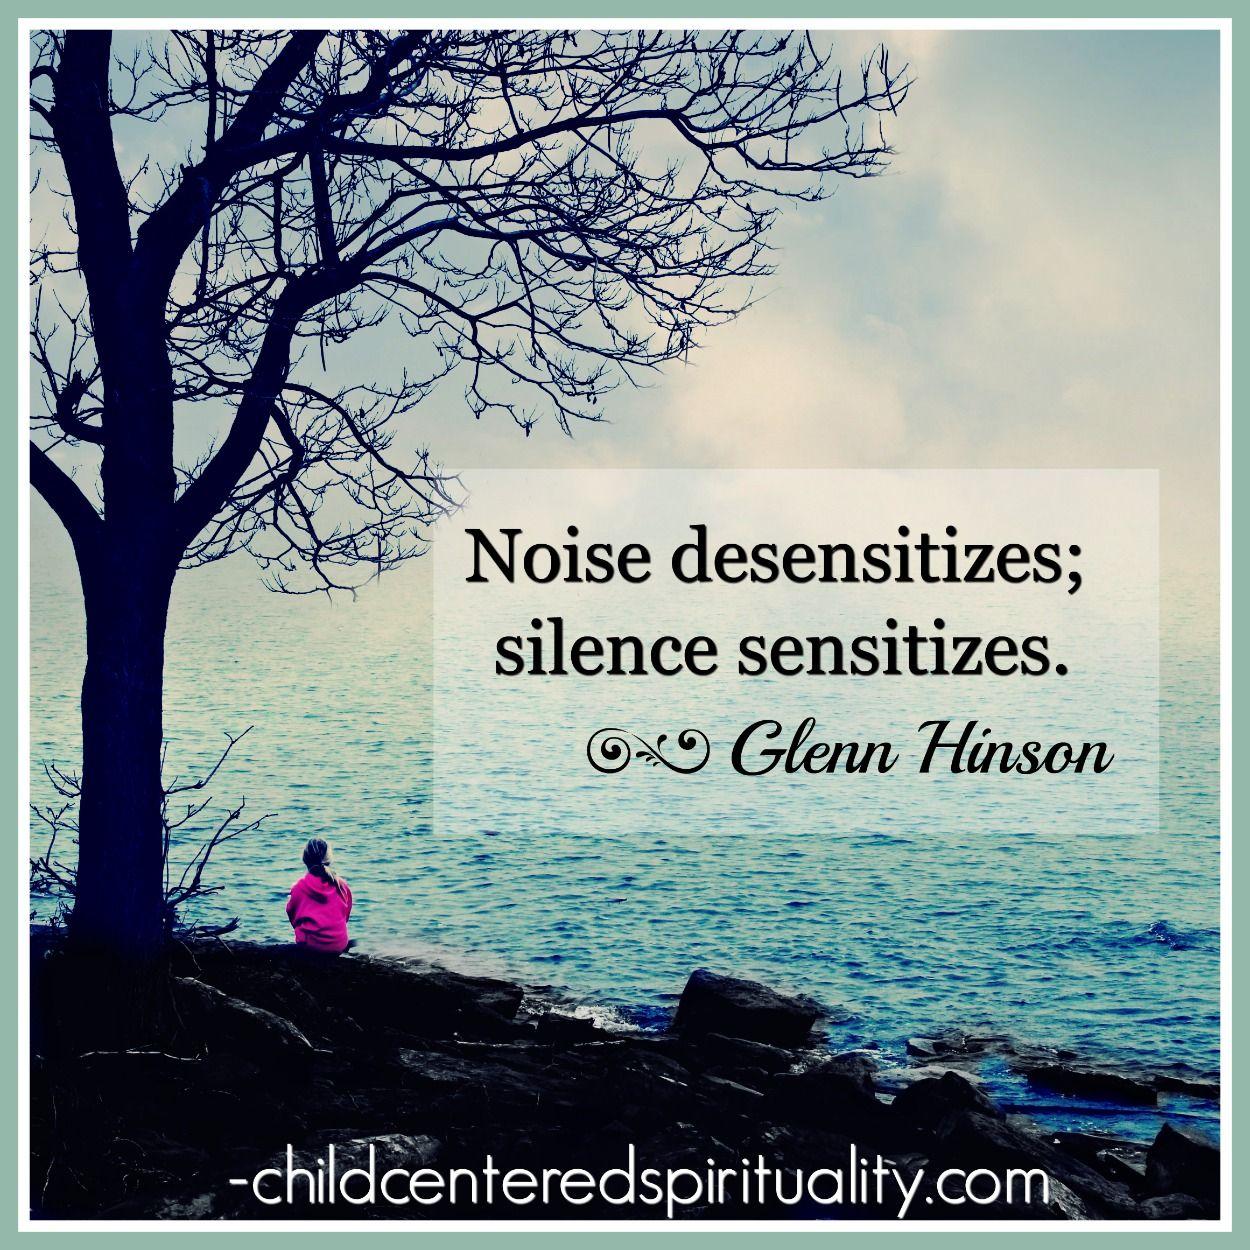 #Quote: Noise desensitizes; silence sensitizes.  --Glenn Hinson